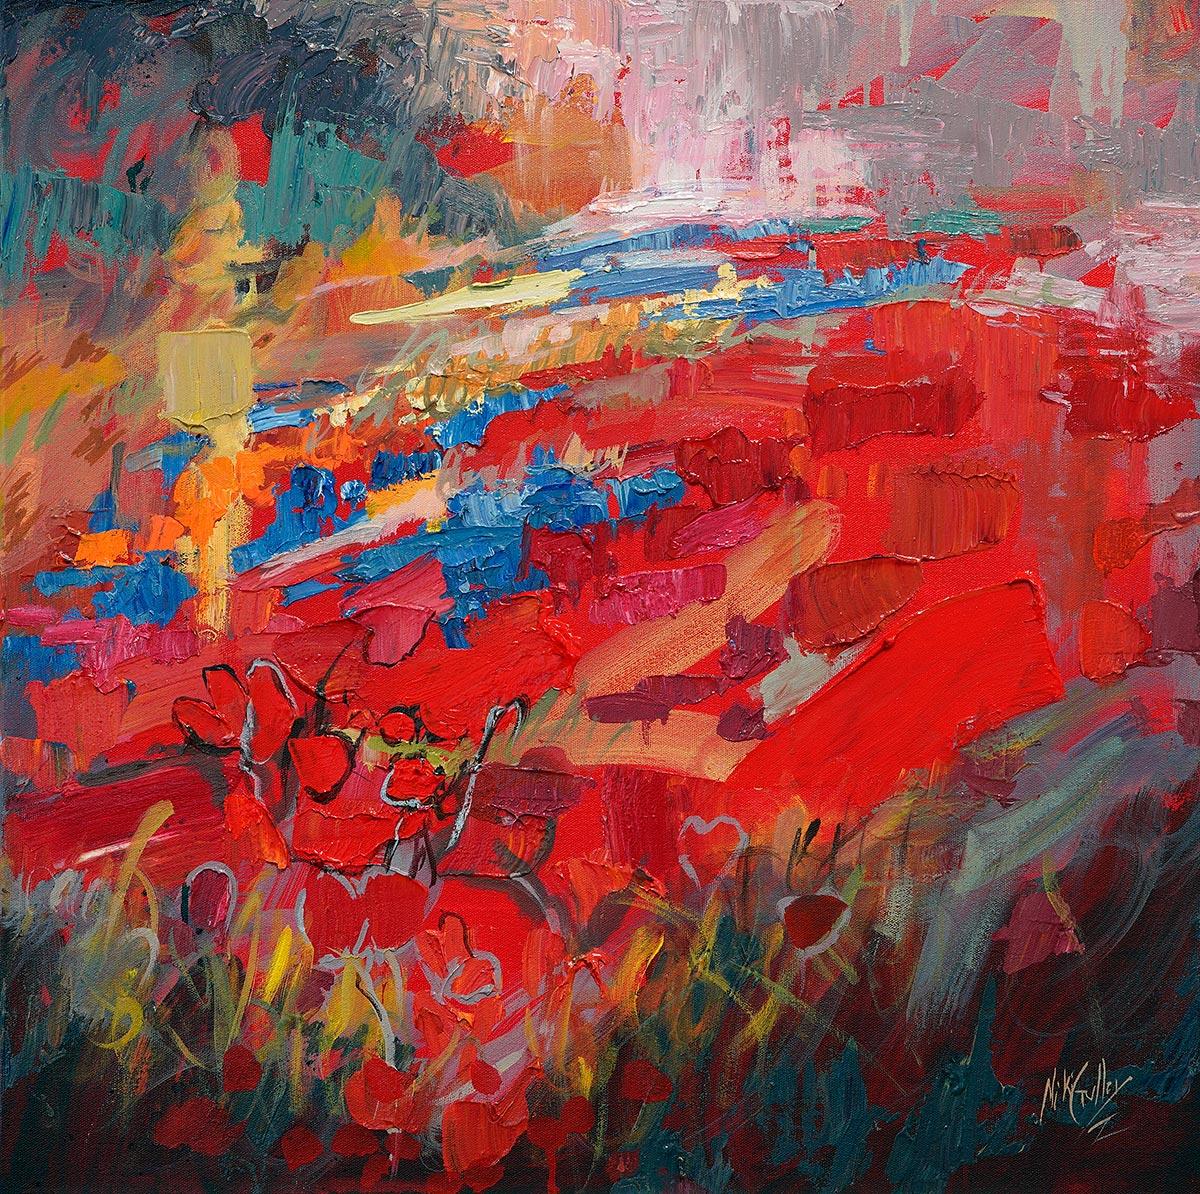 contemporary impressionist, dallas texas artist, Bluebonnet, Niki Gulley paintings